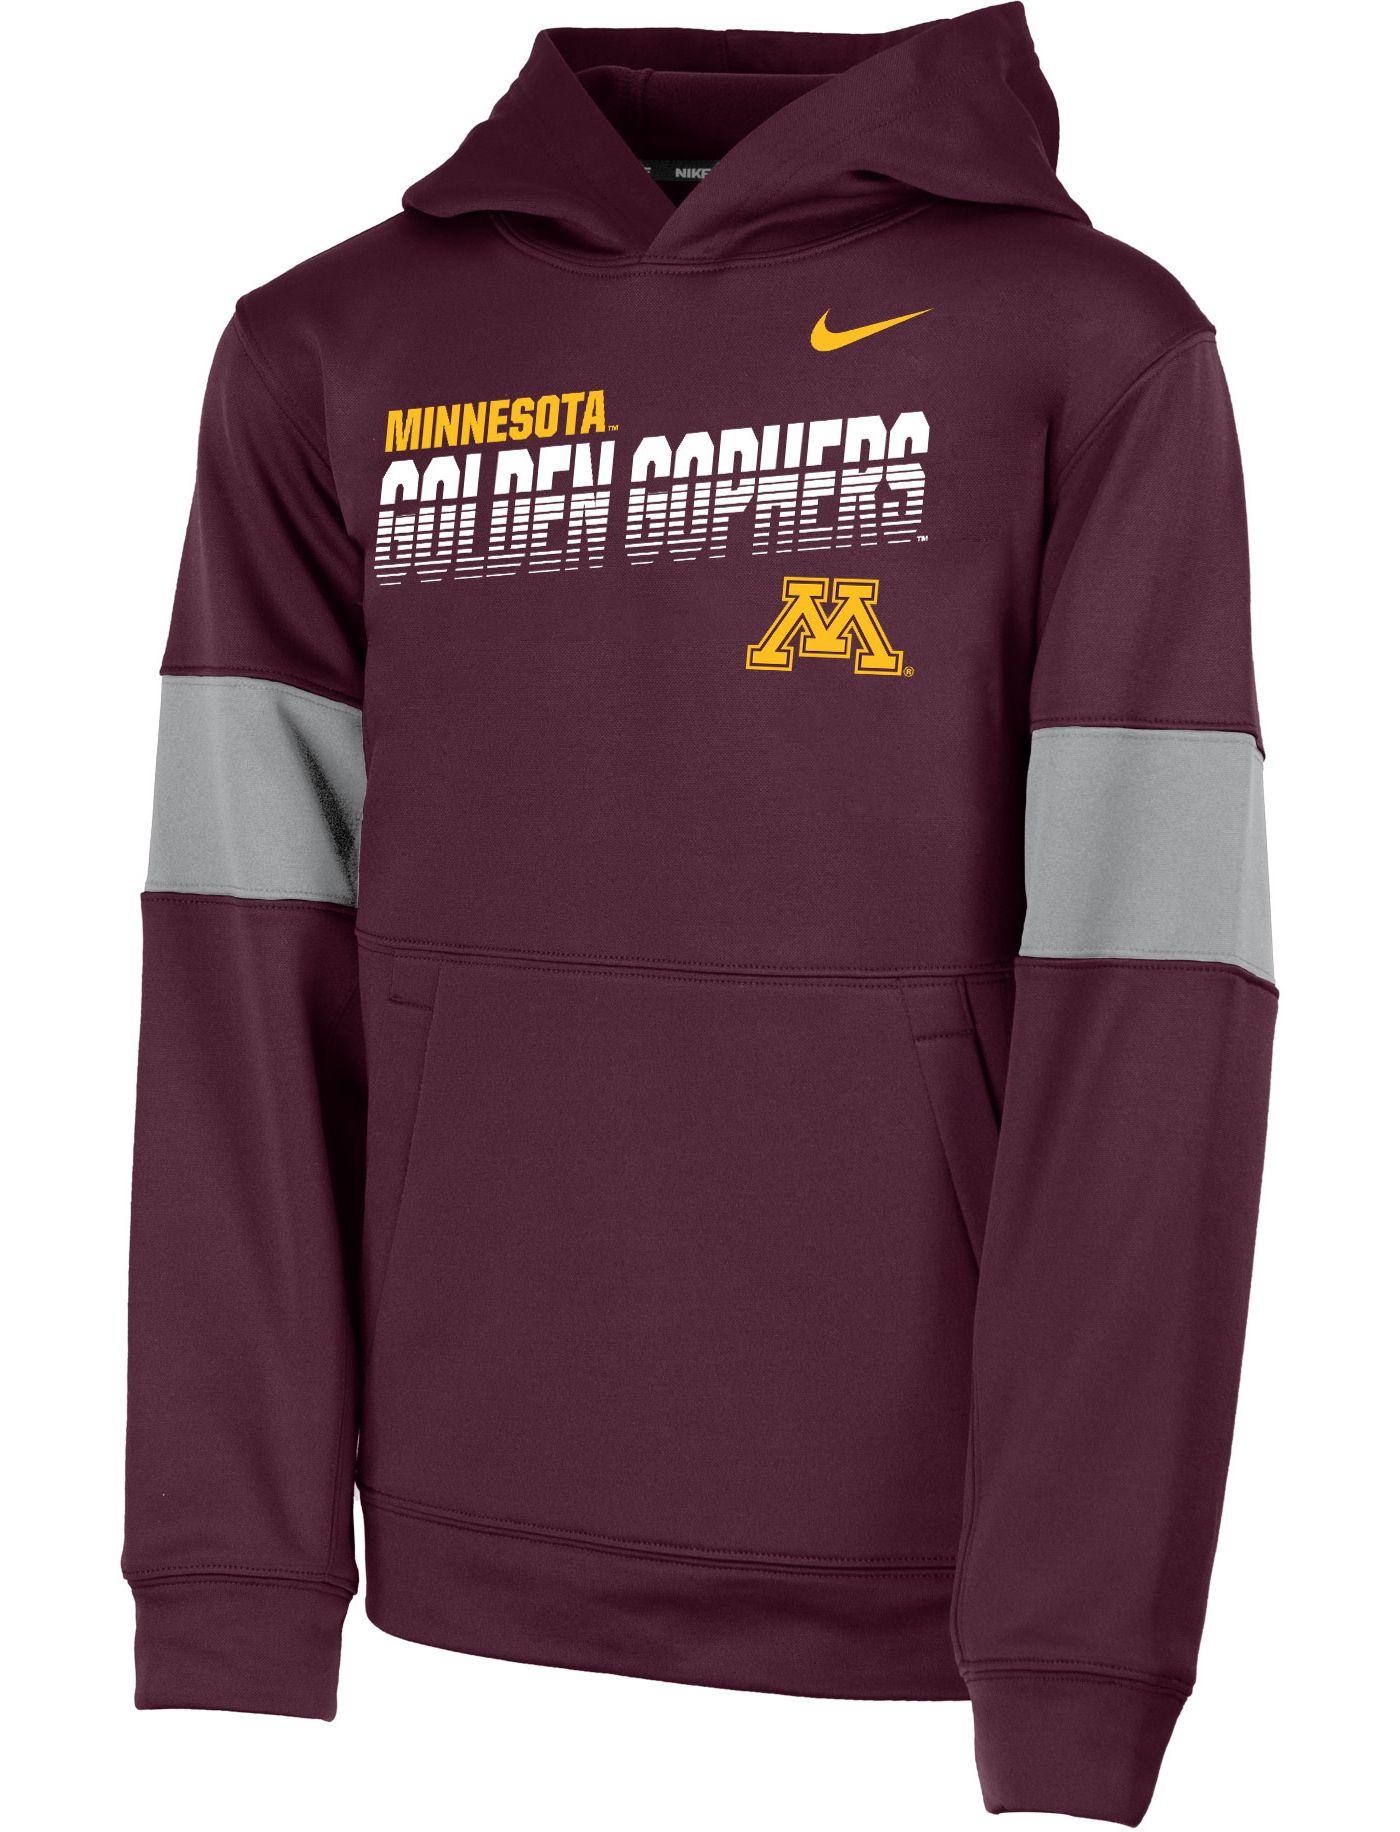 Nike Youth Minnesota Golden Gophers Maroon Therma Football Sideline Pullover Hoodie